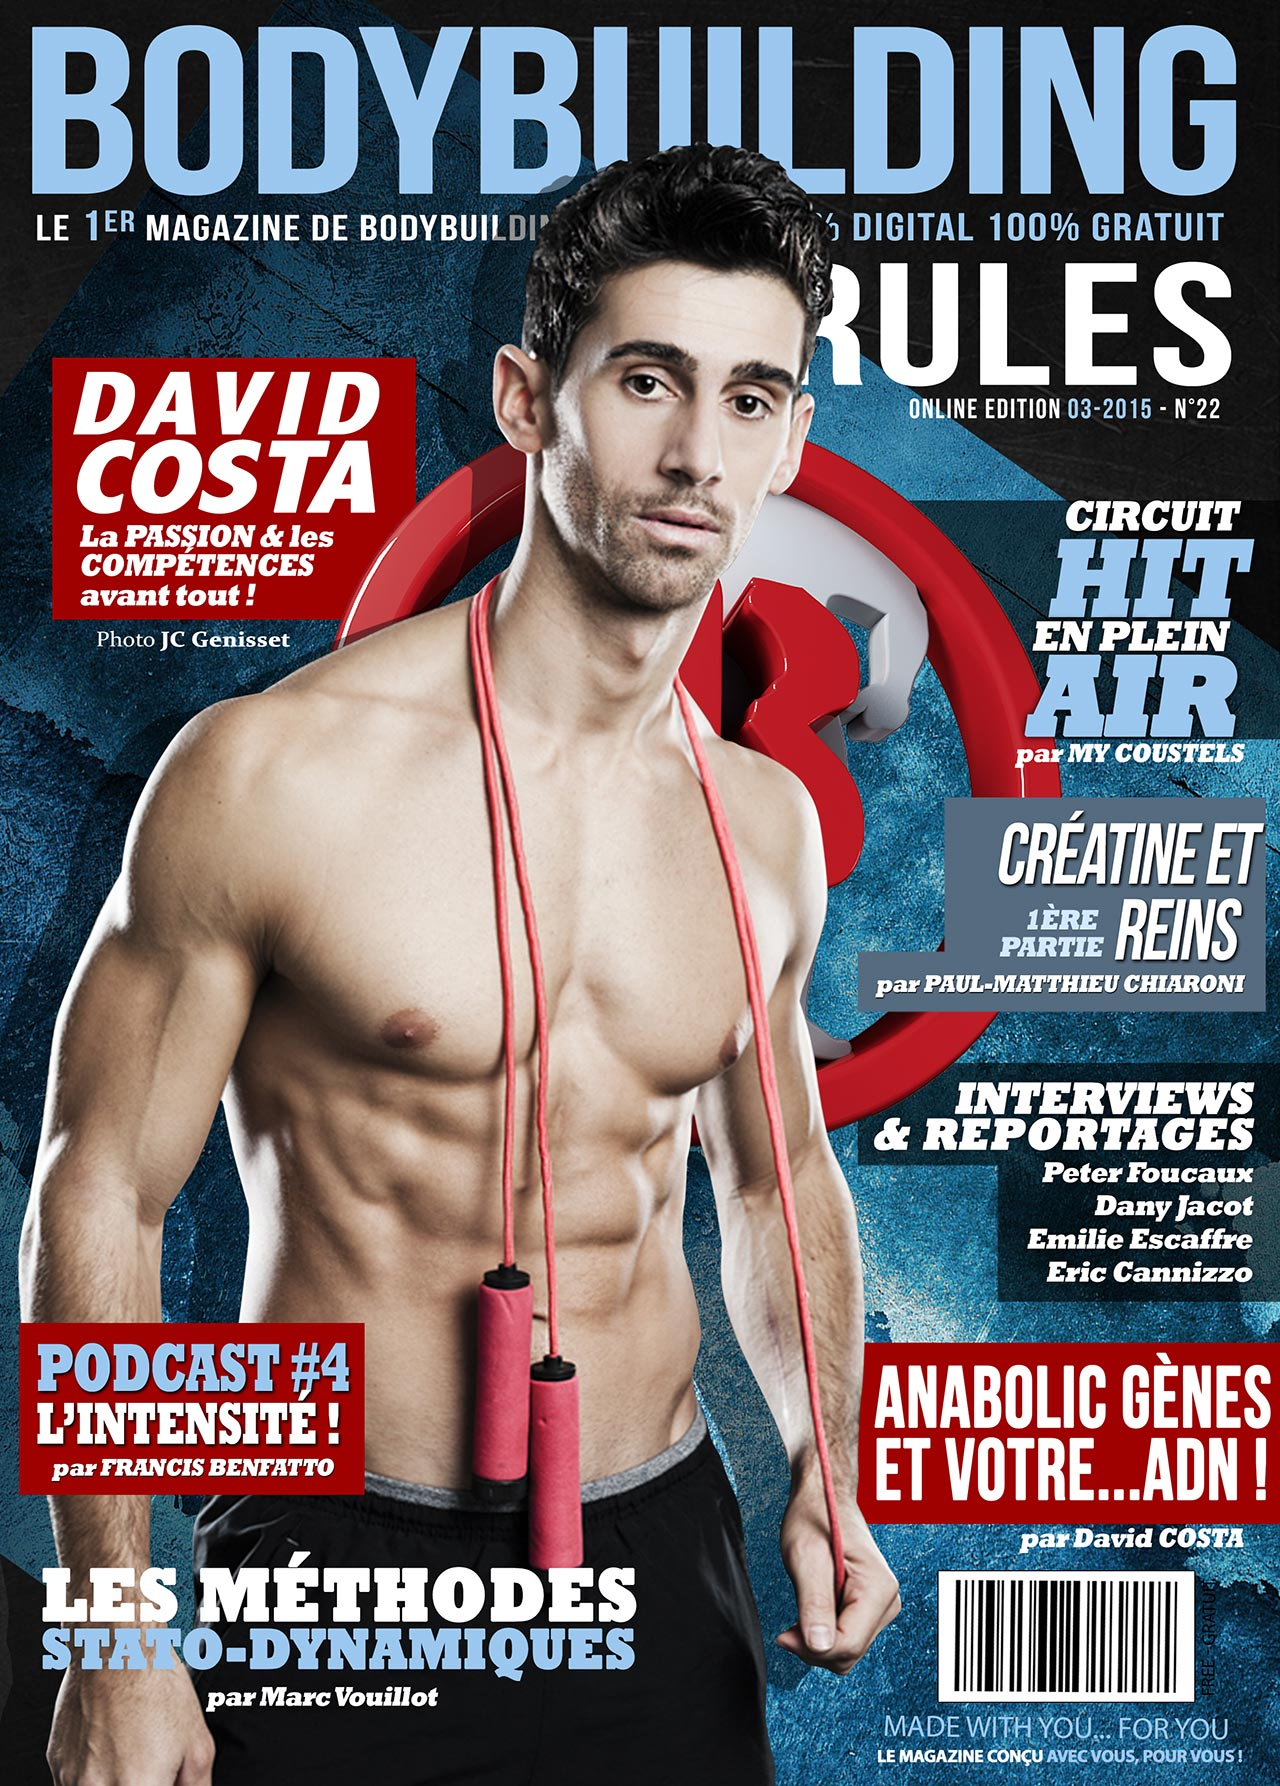 bodybuilding - www.bodybuilding-rules.com le magazine interactif GRATUIT  1bbrM22